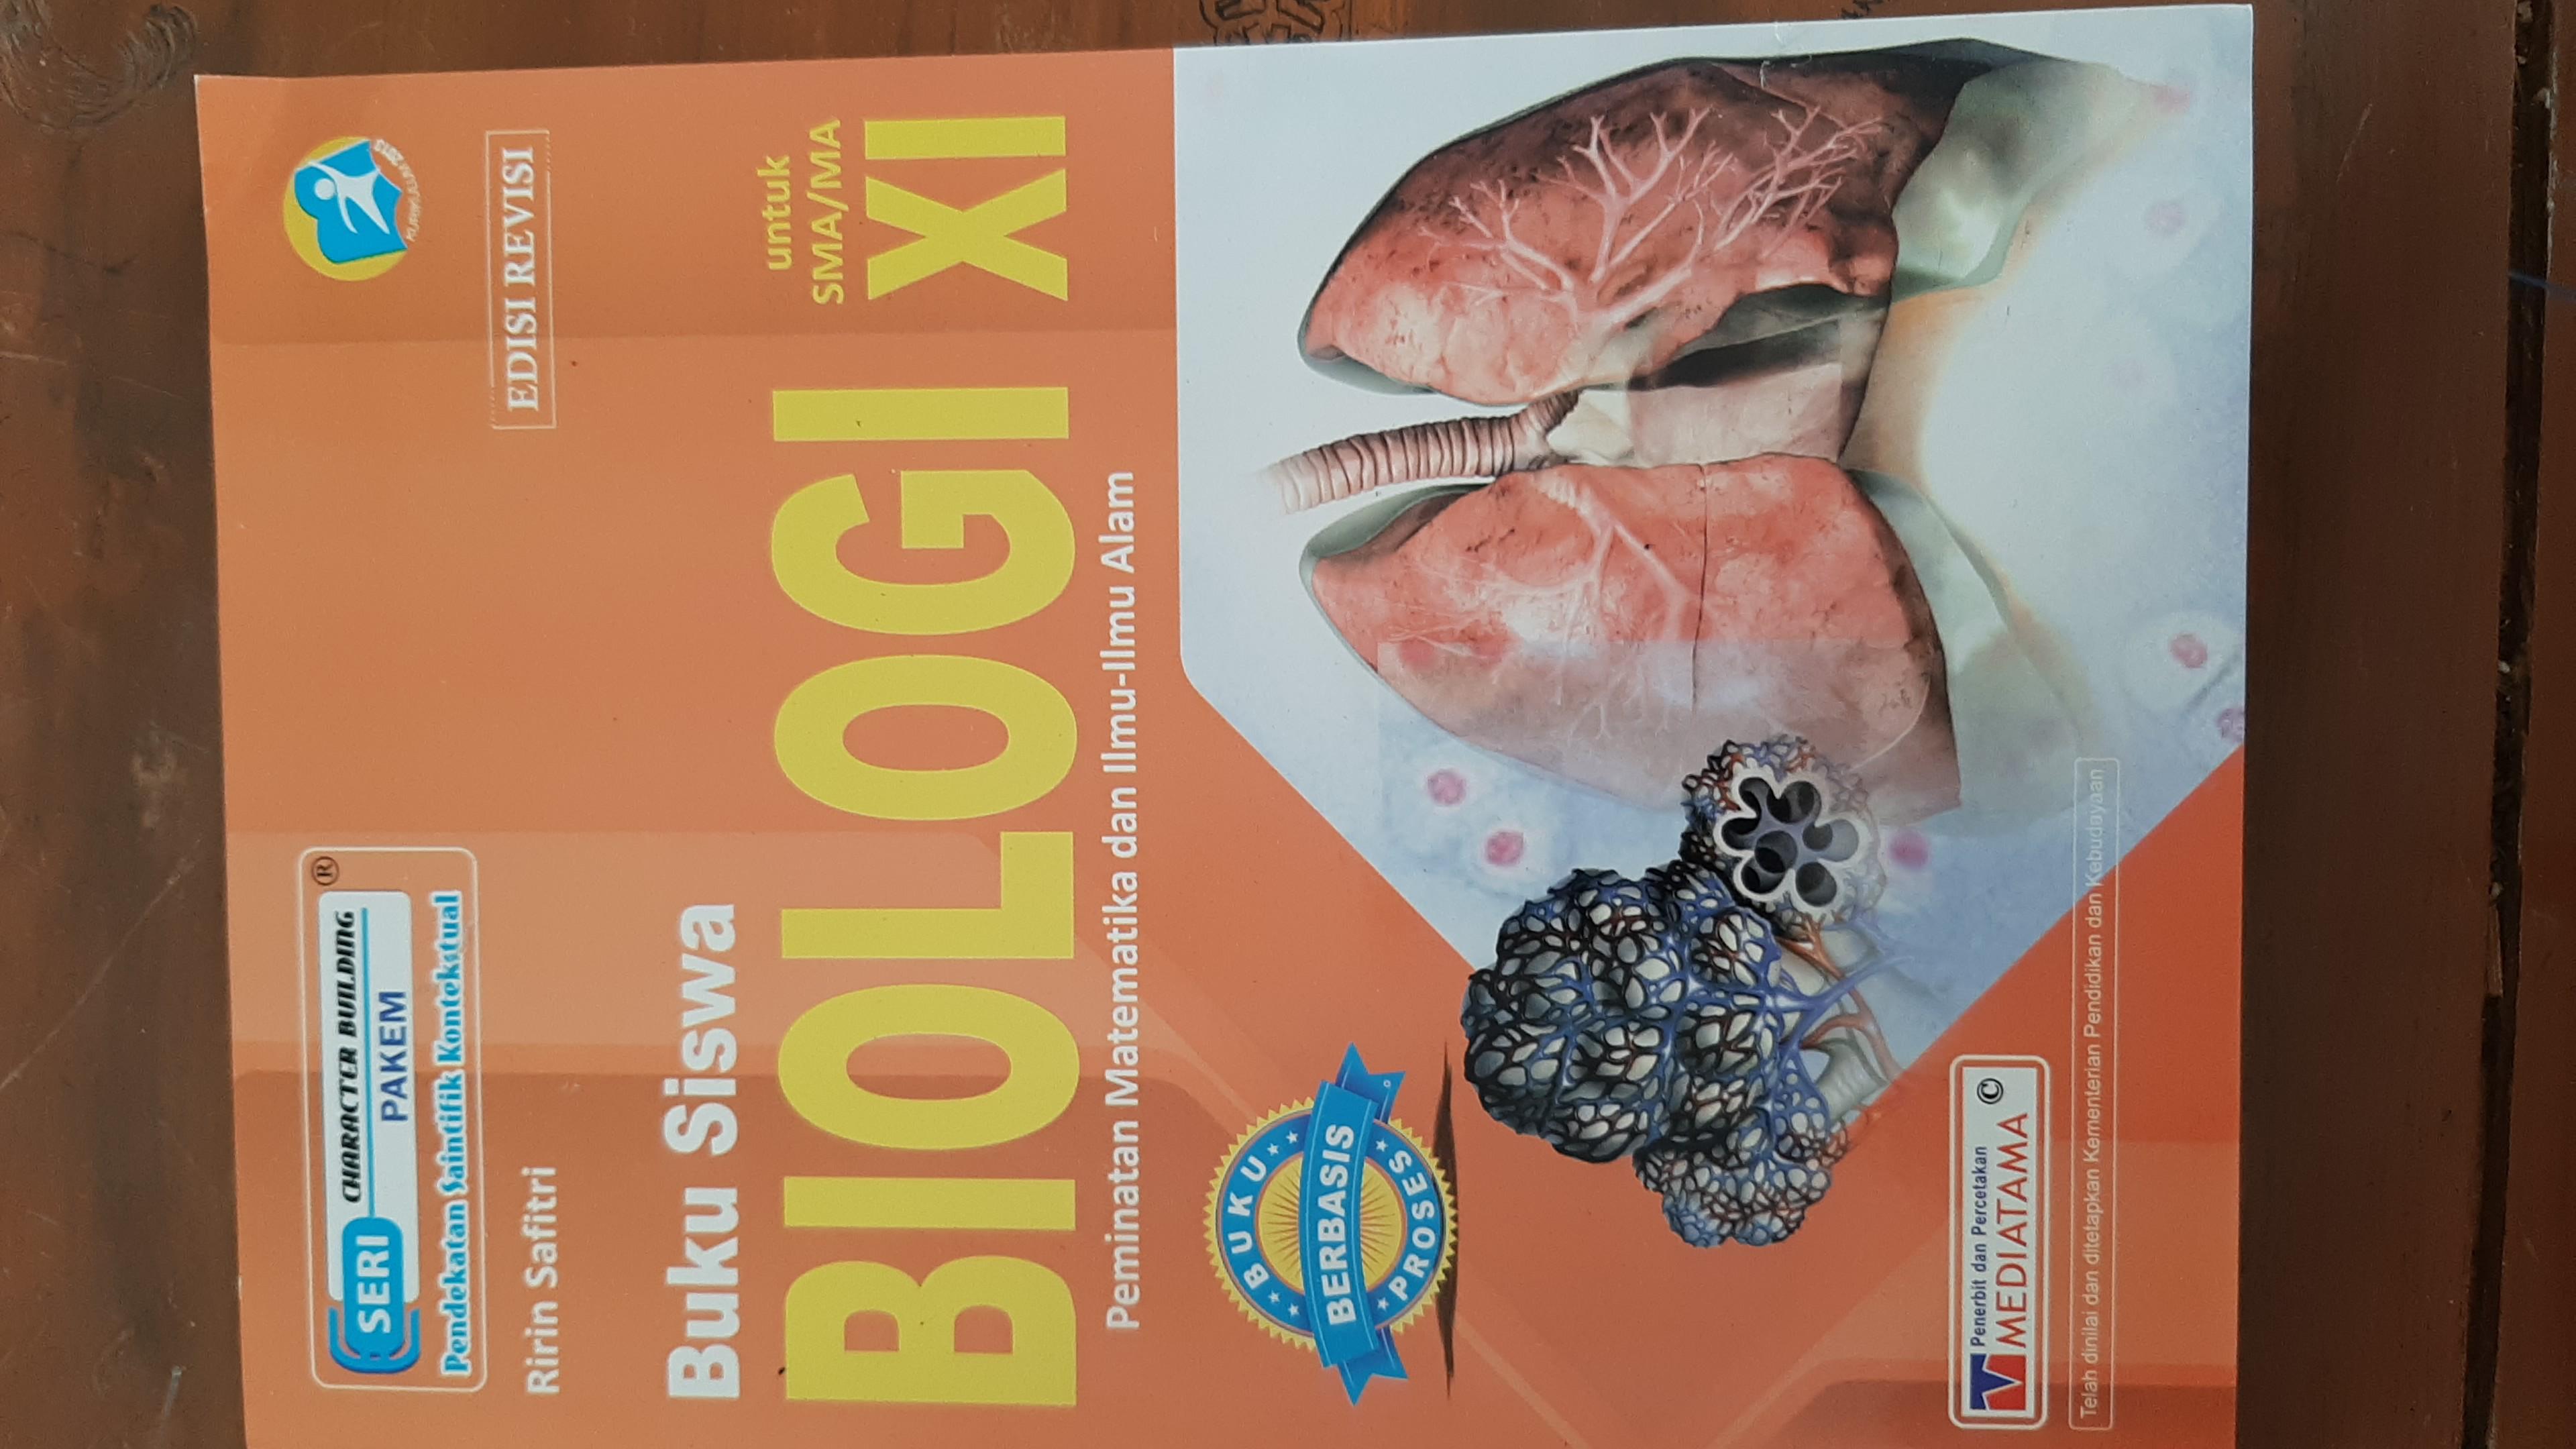 Buku Siswa Biologi Peminatan Matematika Dan Ilmu-Ilmu Alam Untuk SMA/MA Kelas XI